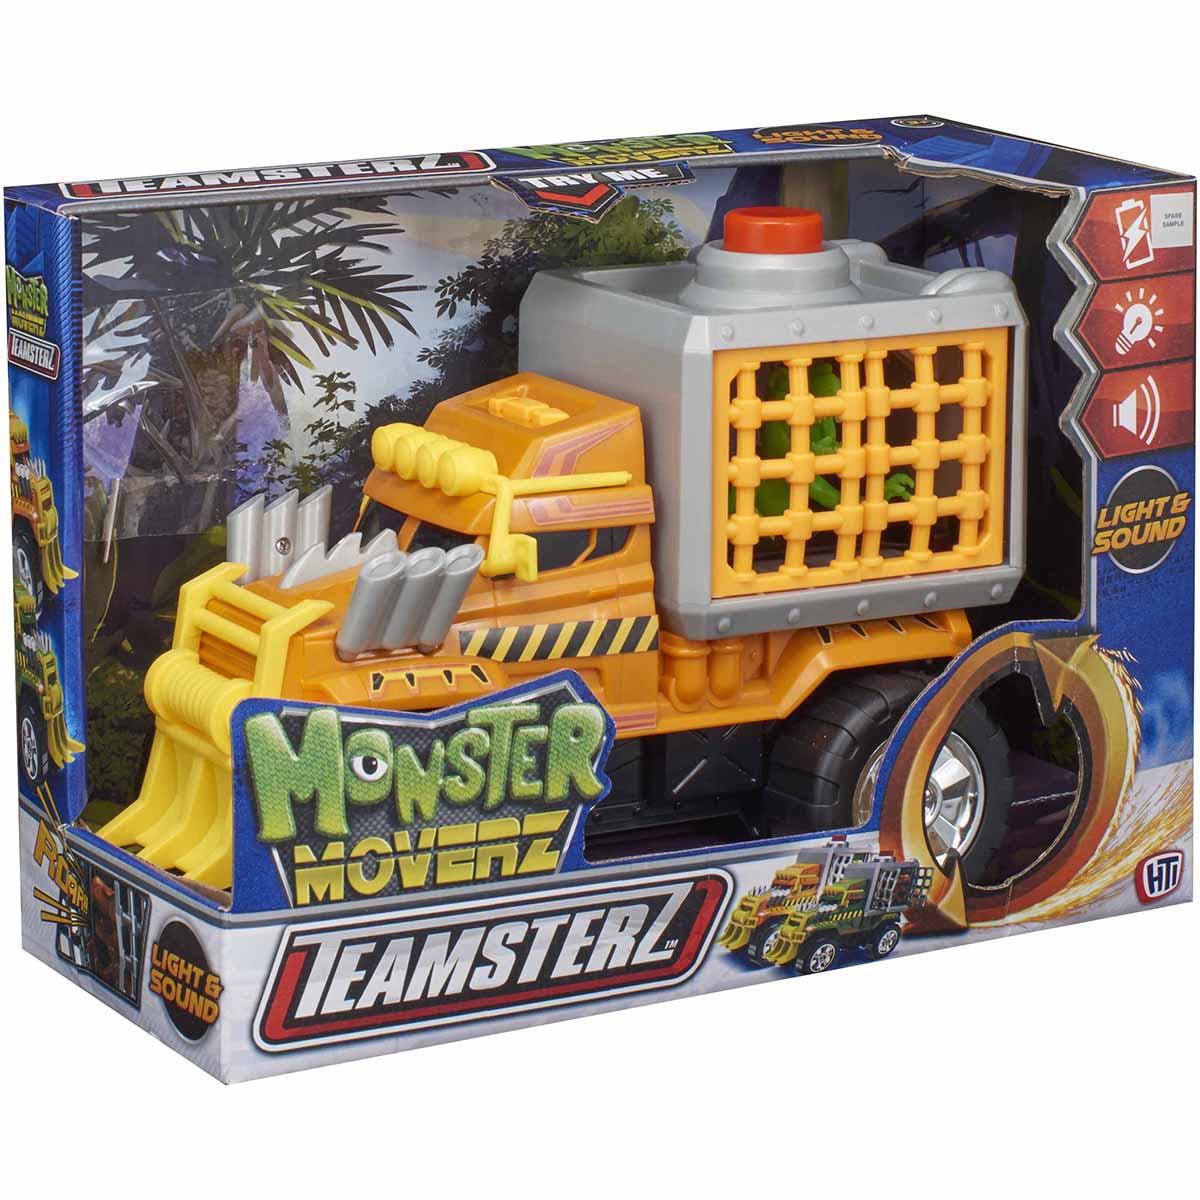 Masinuta cu lumini si sunete Teamsterz, Monster Dino Escape, Portocaliu